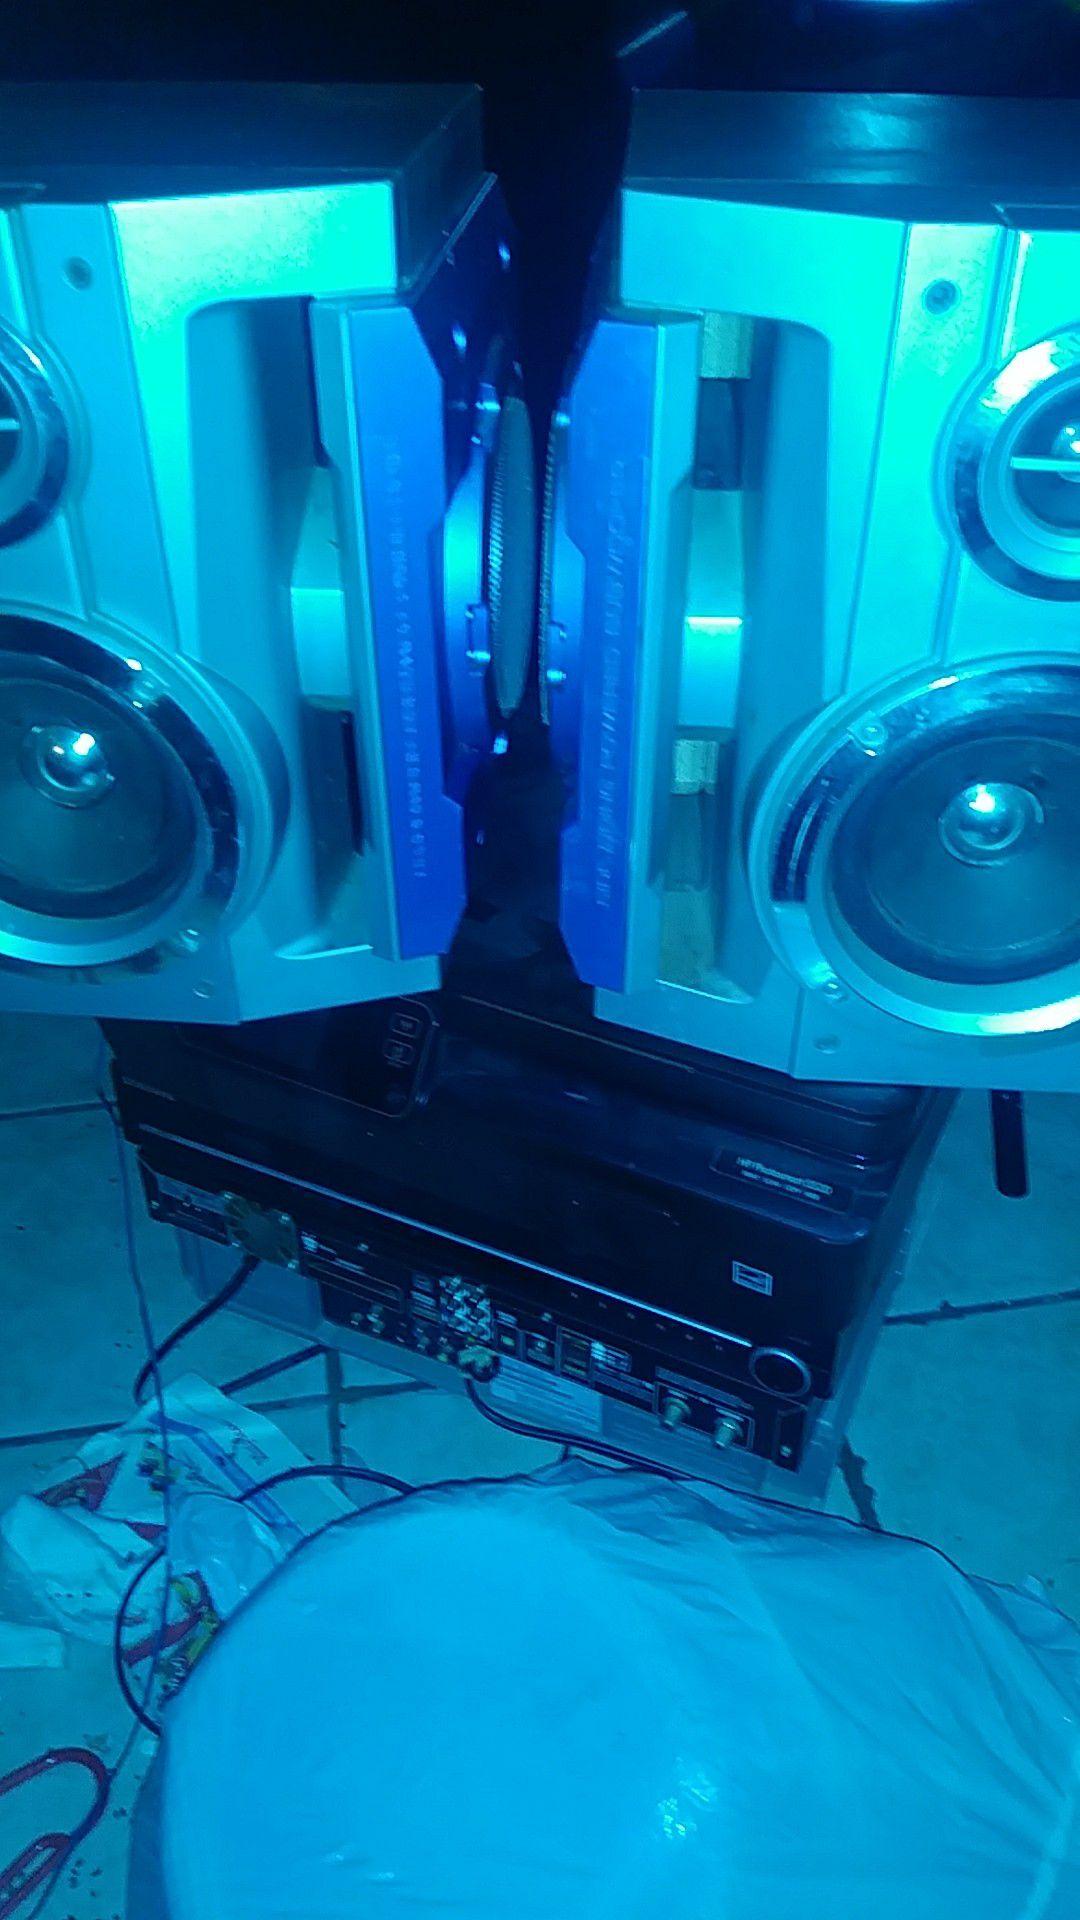 Sharp speaker's( subwoofer woofer and tweeter- 200 watts)